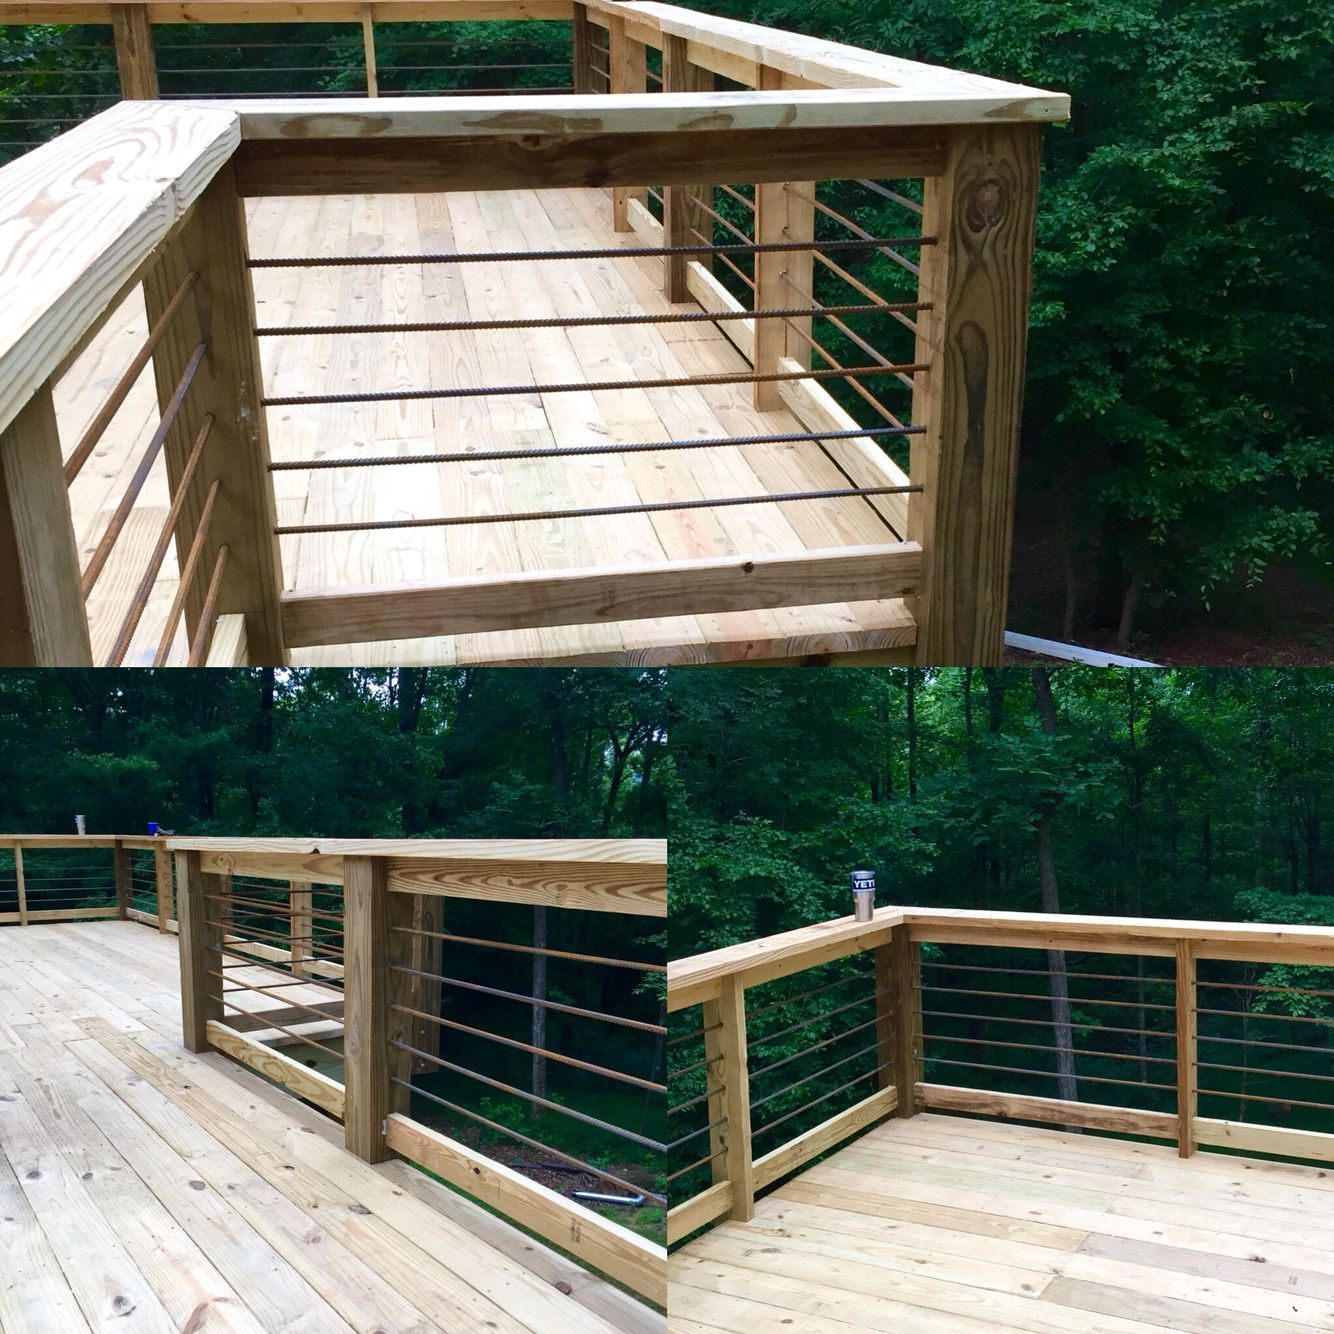 Rebar handrail on deck